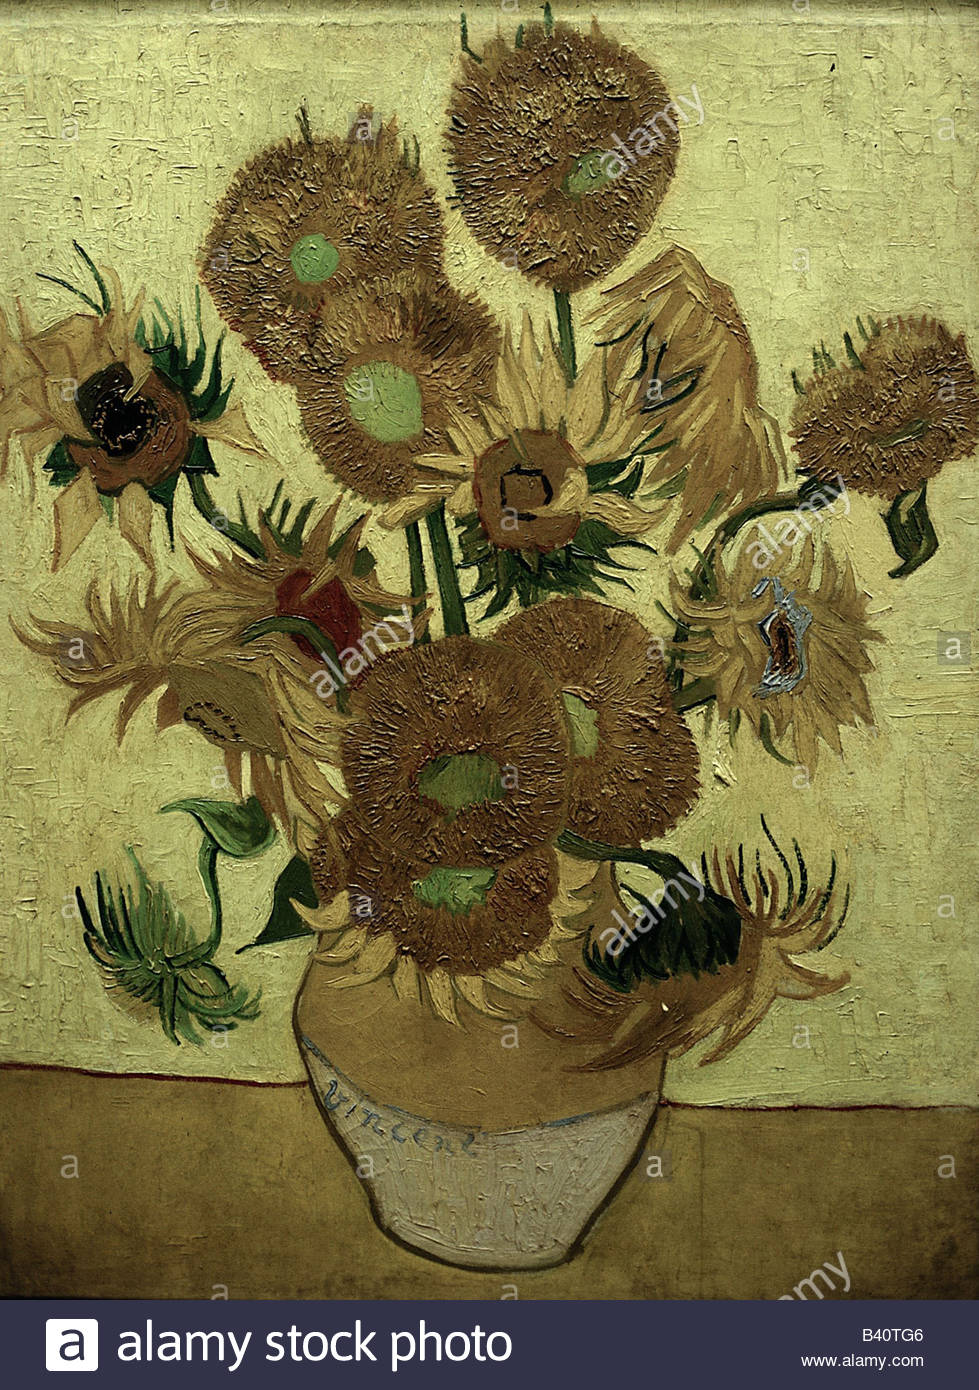 "Bellas artes, Vincent van Gogh (1853 - 1890), pintura, ""Catorce girasoles en un jarrón"", 1889, óleo Imagen De Stock"